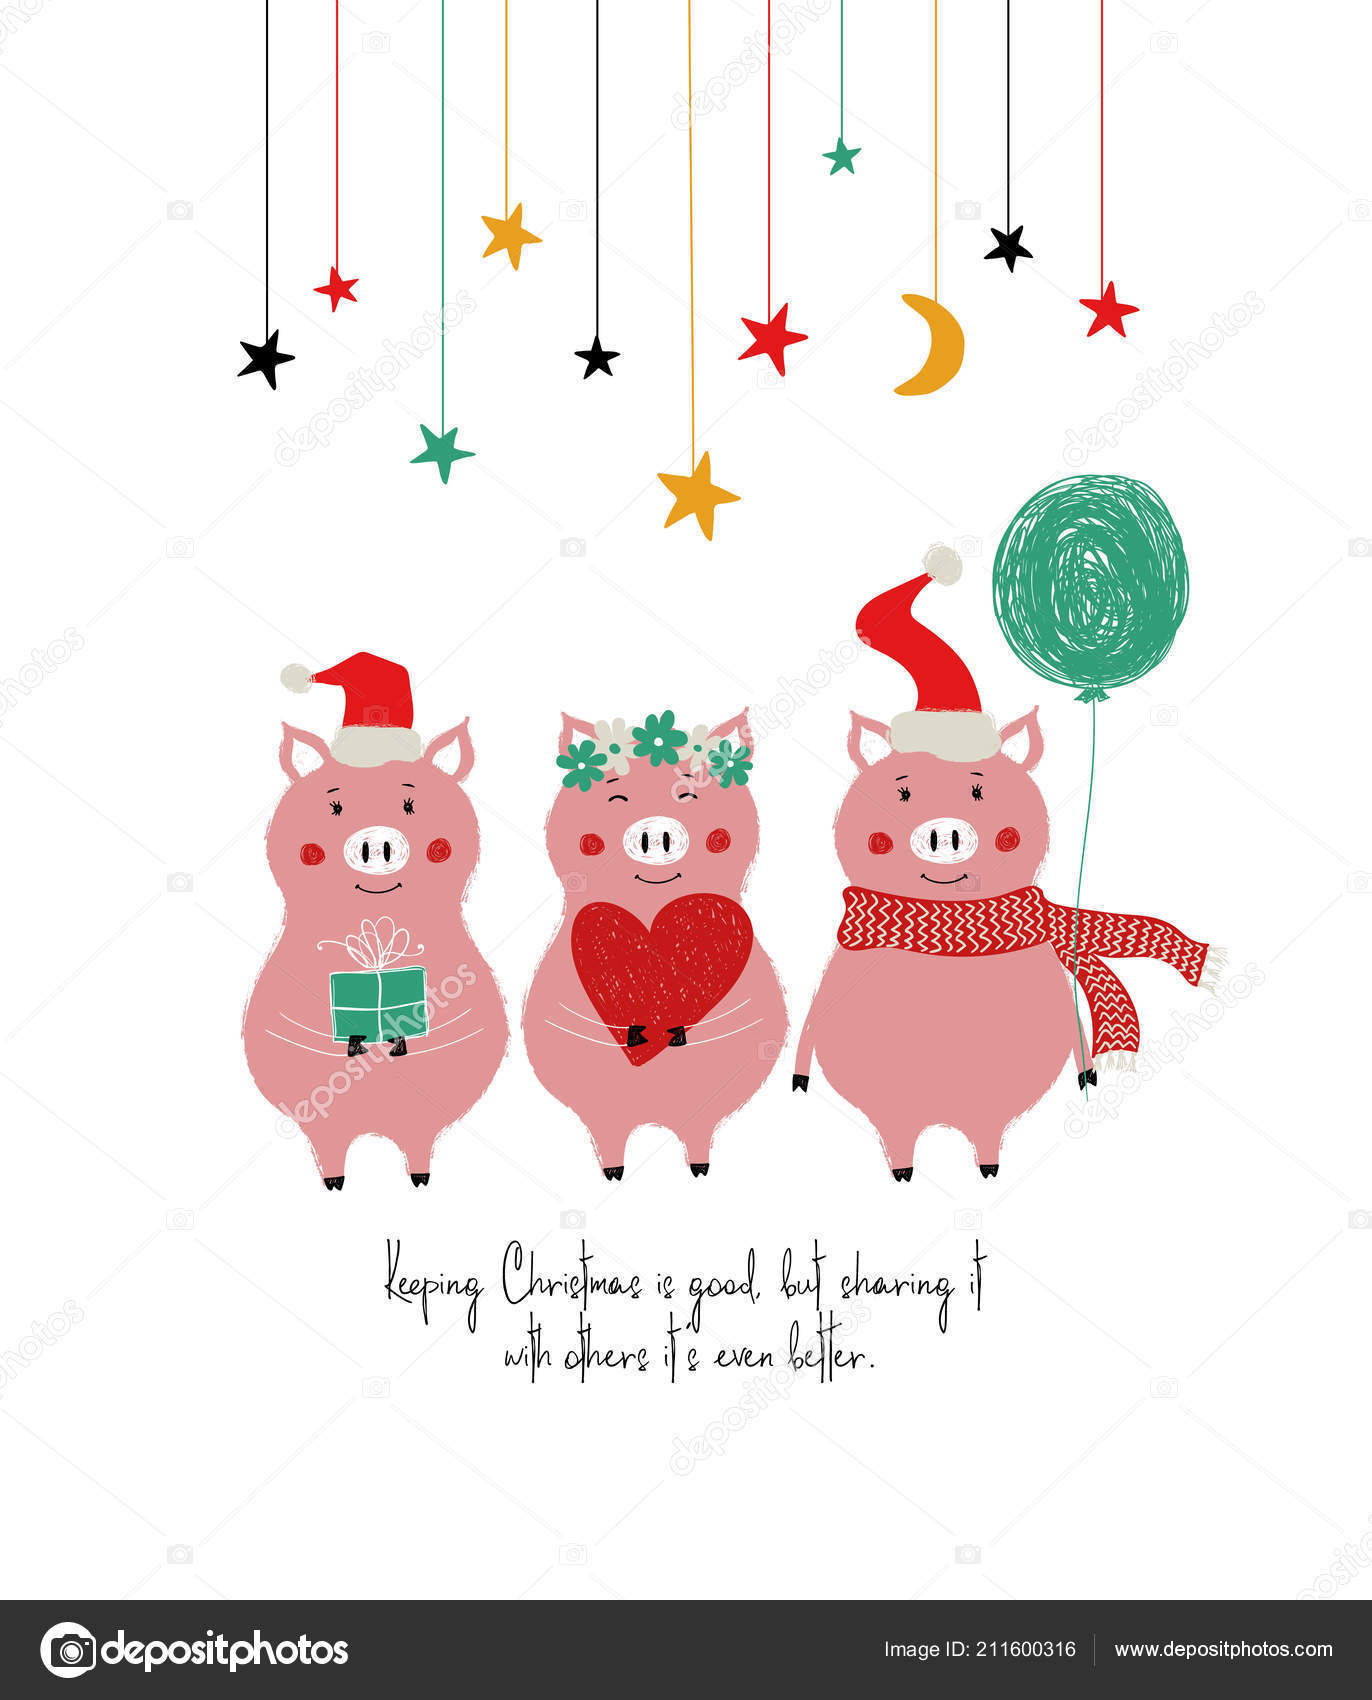 Christmas New Year Greeting Card Cute Pigs Phrase Keeping Christmas